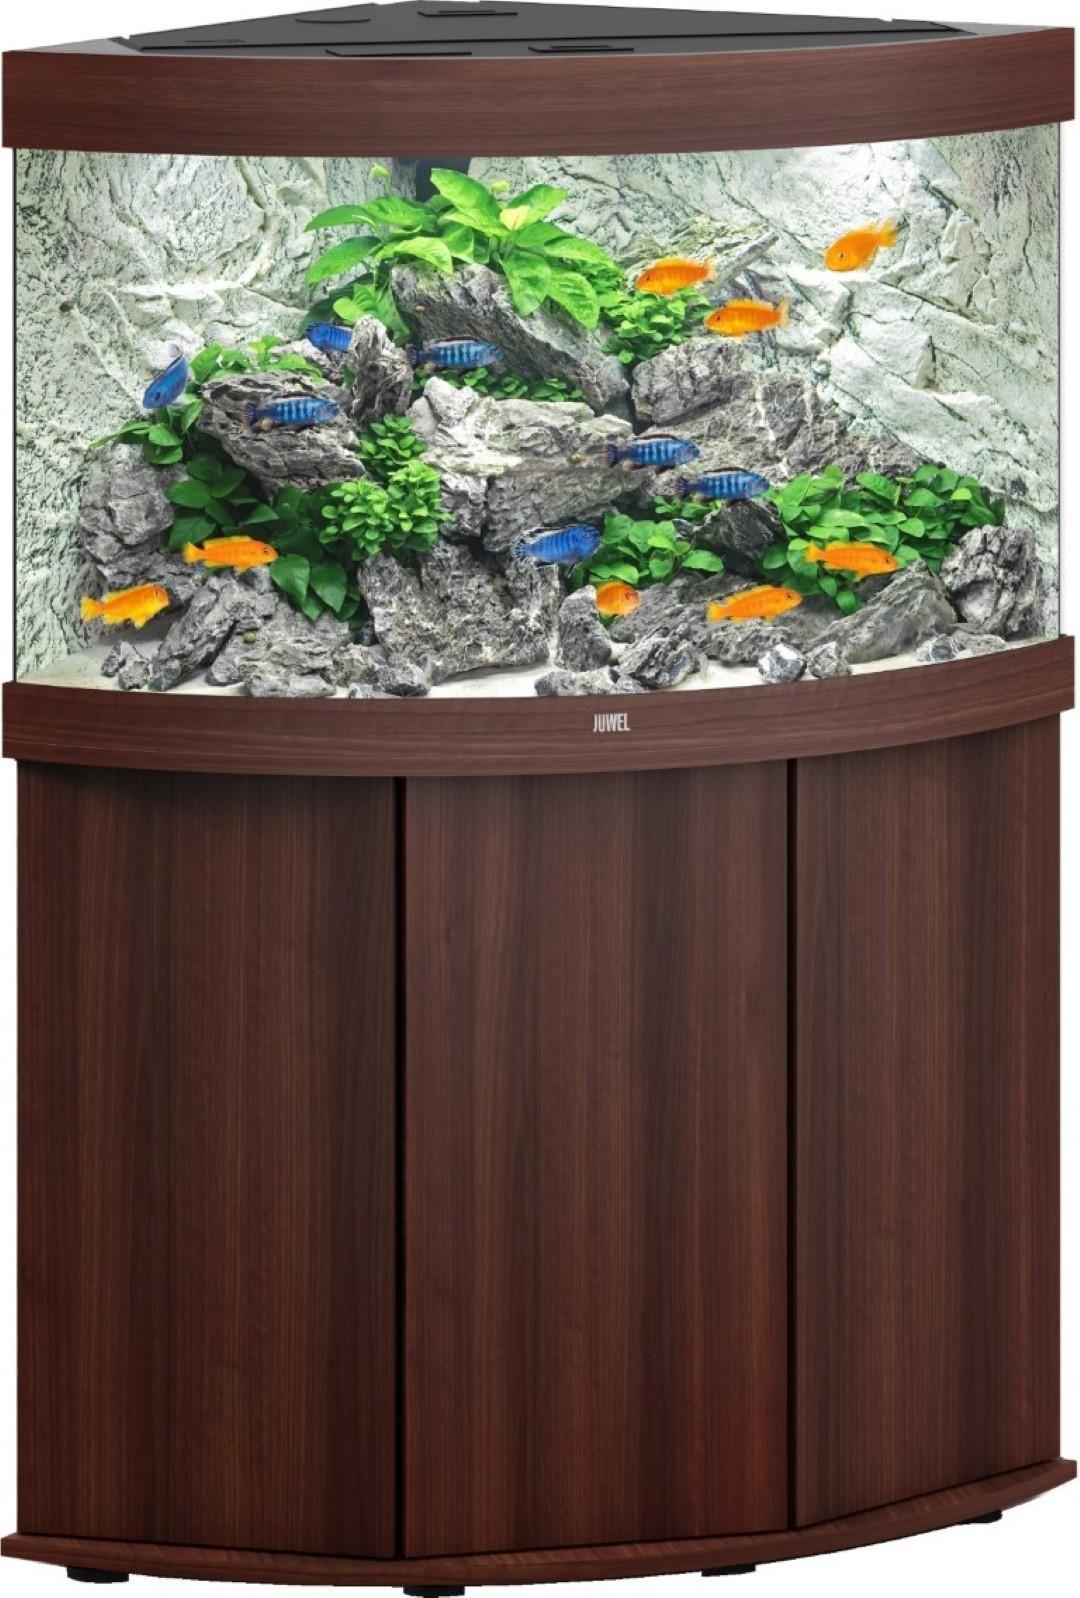 Juwel aquarium Trigon 190 LED met filter donkerbruin